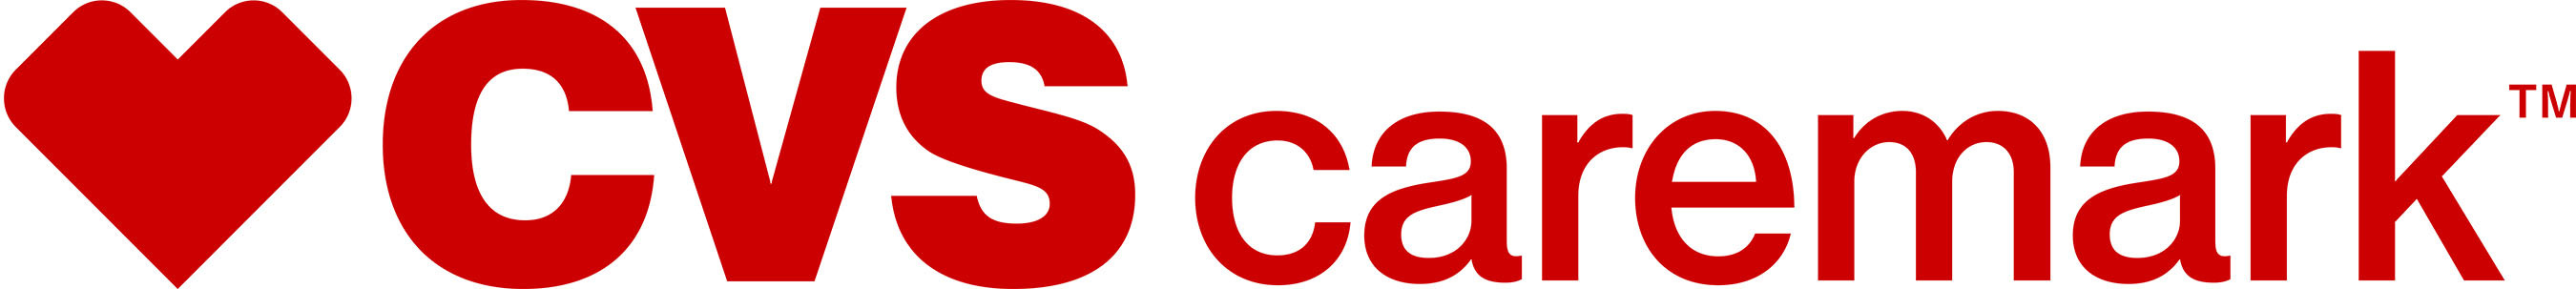 CVS Caremark logo. (PRNewsFoto/CVS Caremark Corporation) (PRNewsFoto/CVS CAREMARK)